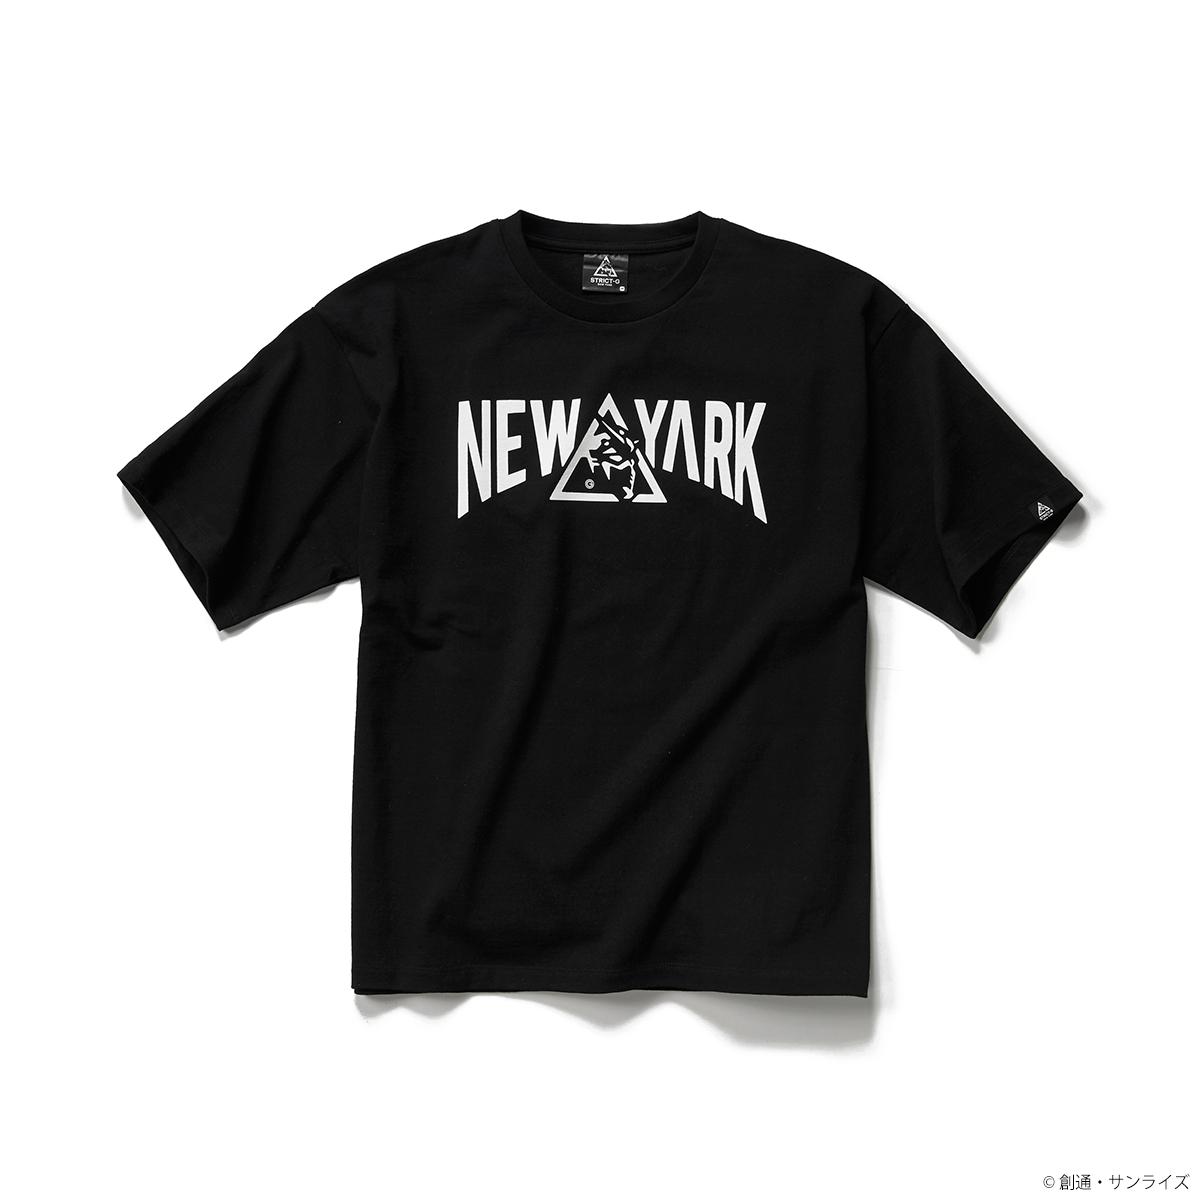 「STRICT-G NEW YARK」ビッグTシャツ